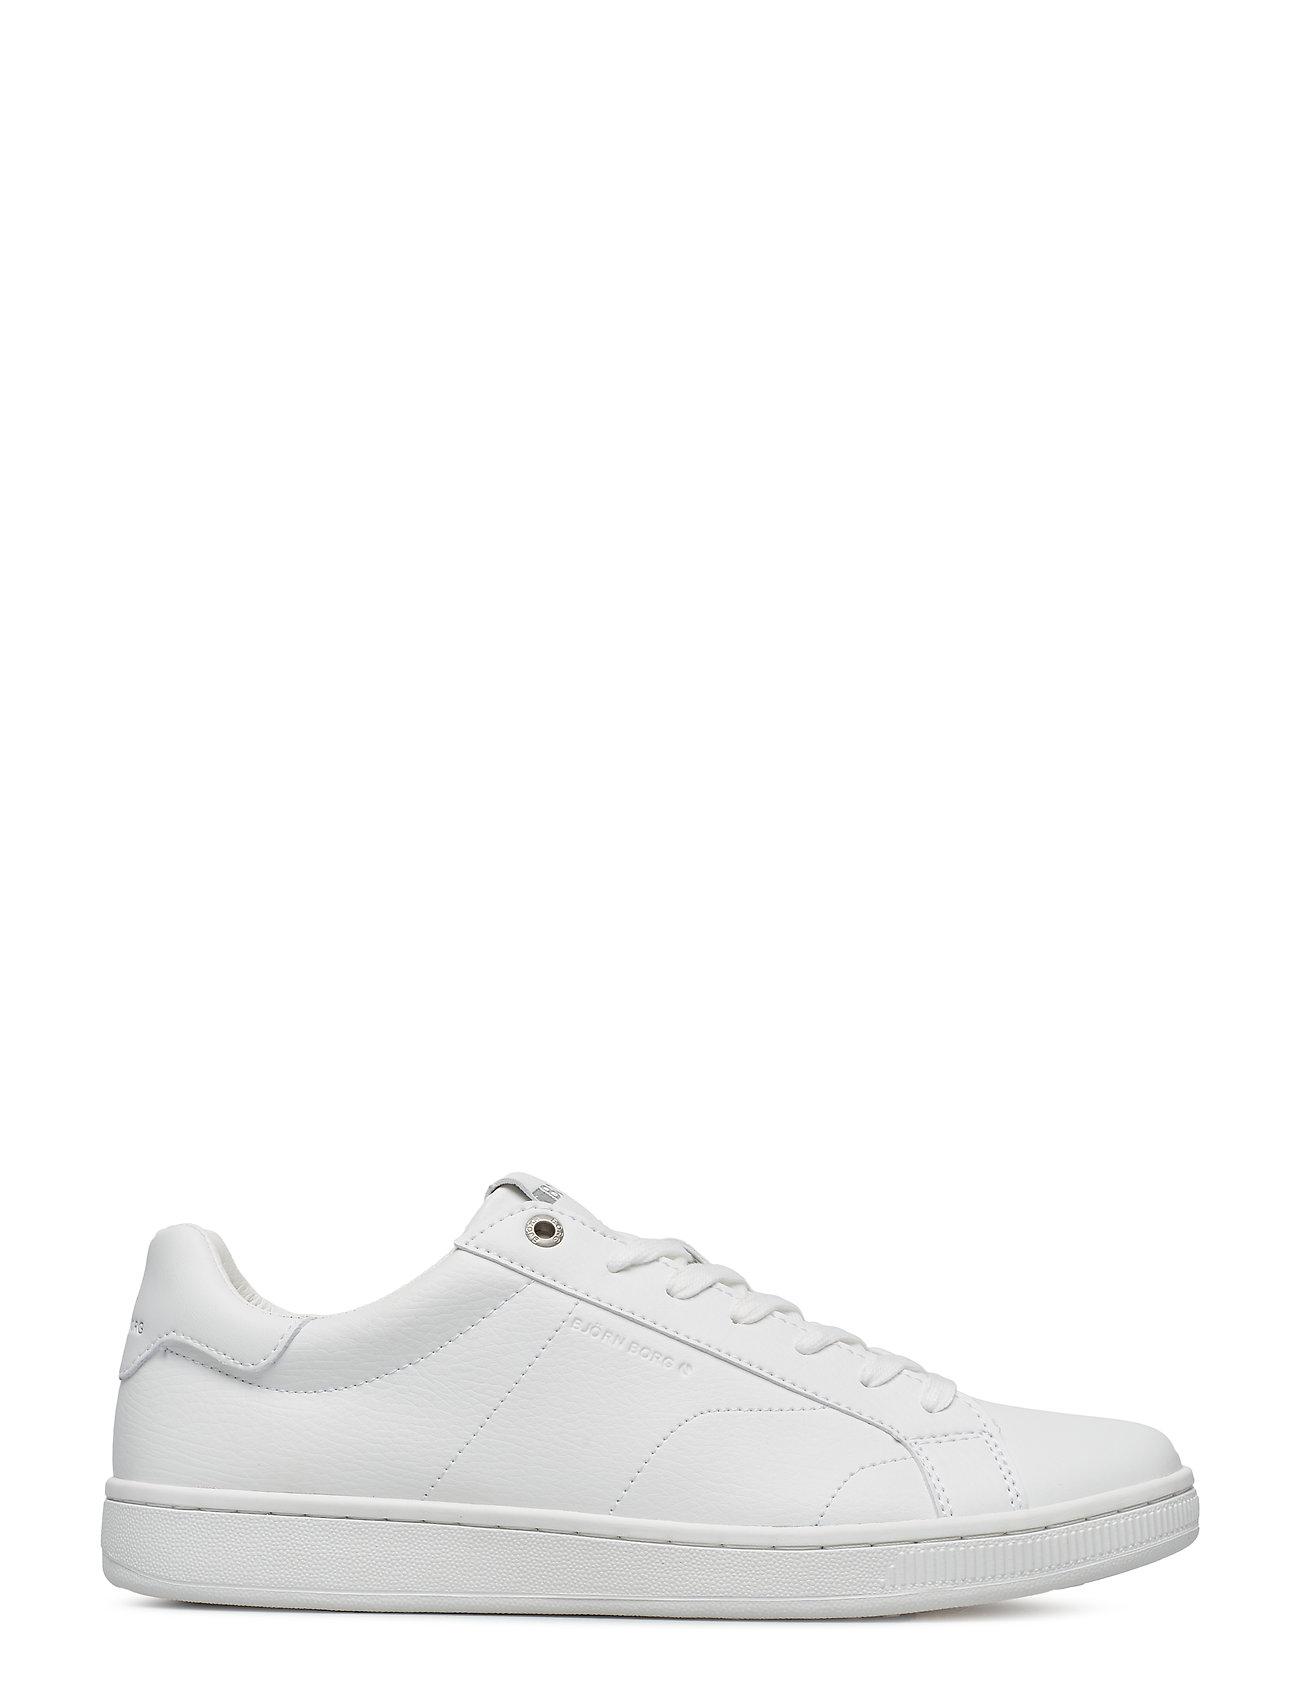 T305 Low Cls M Low top Sneakers Hvid BJÖRN BORG